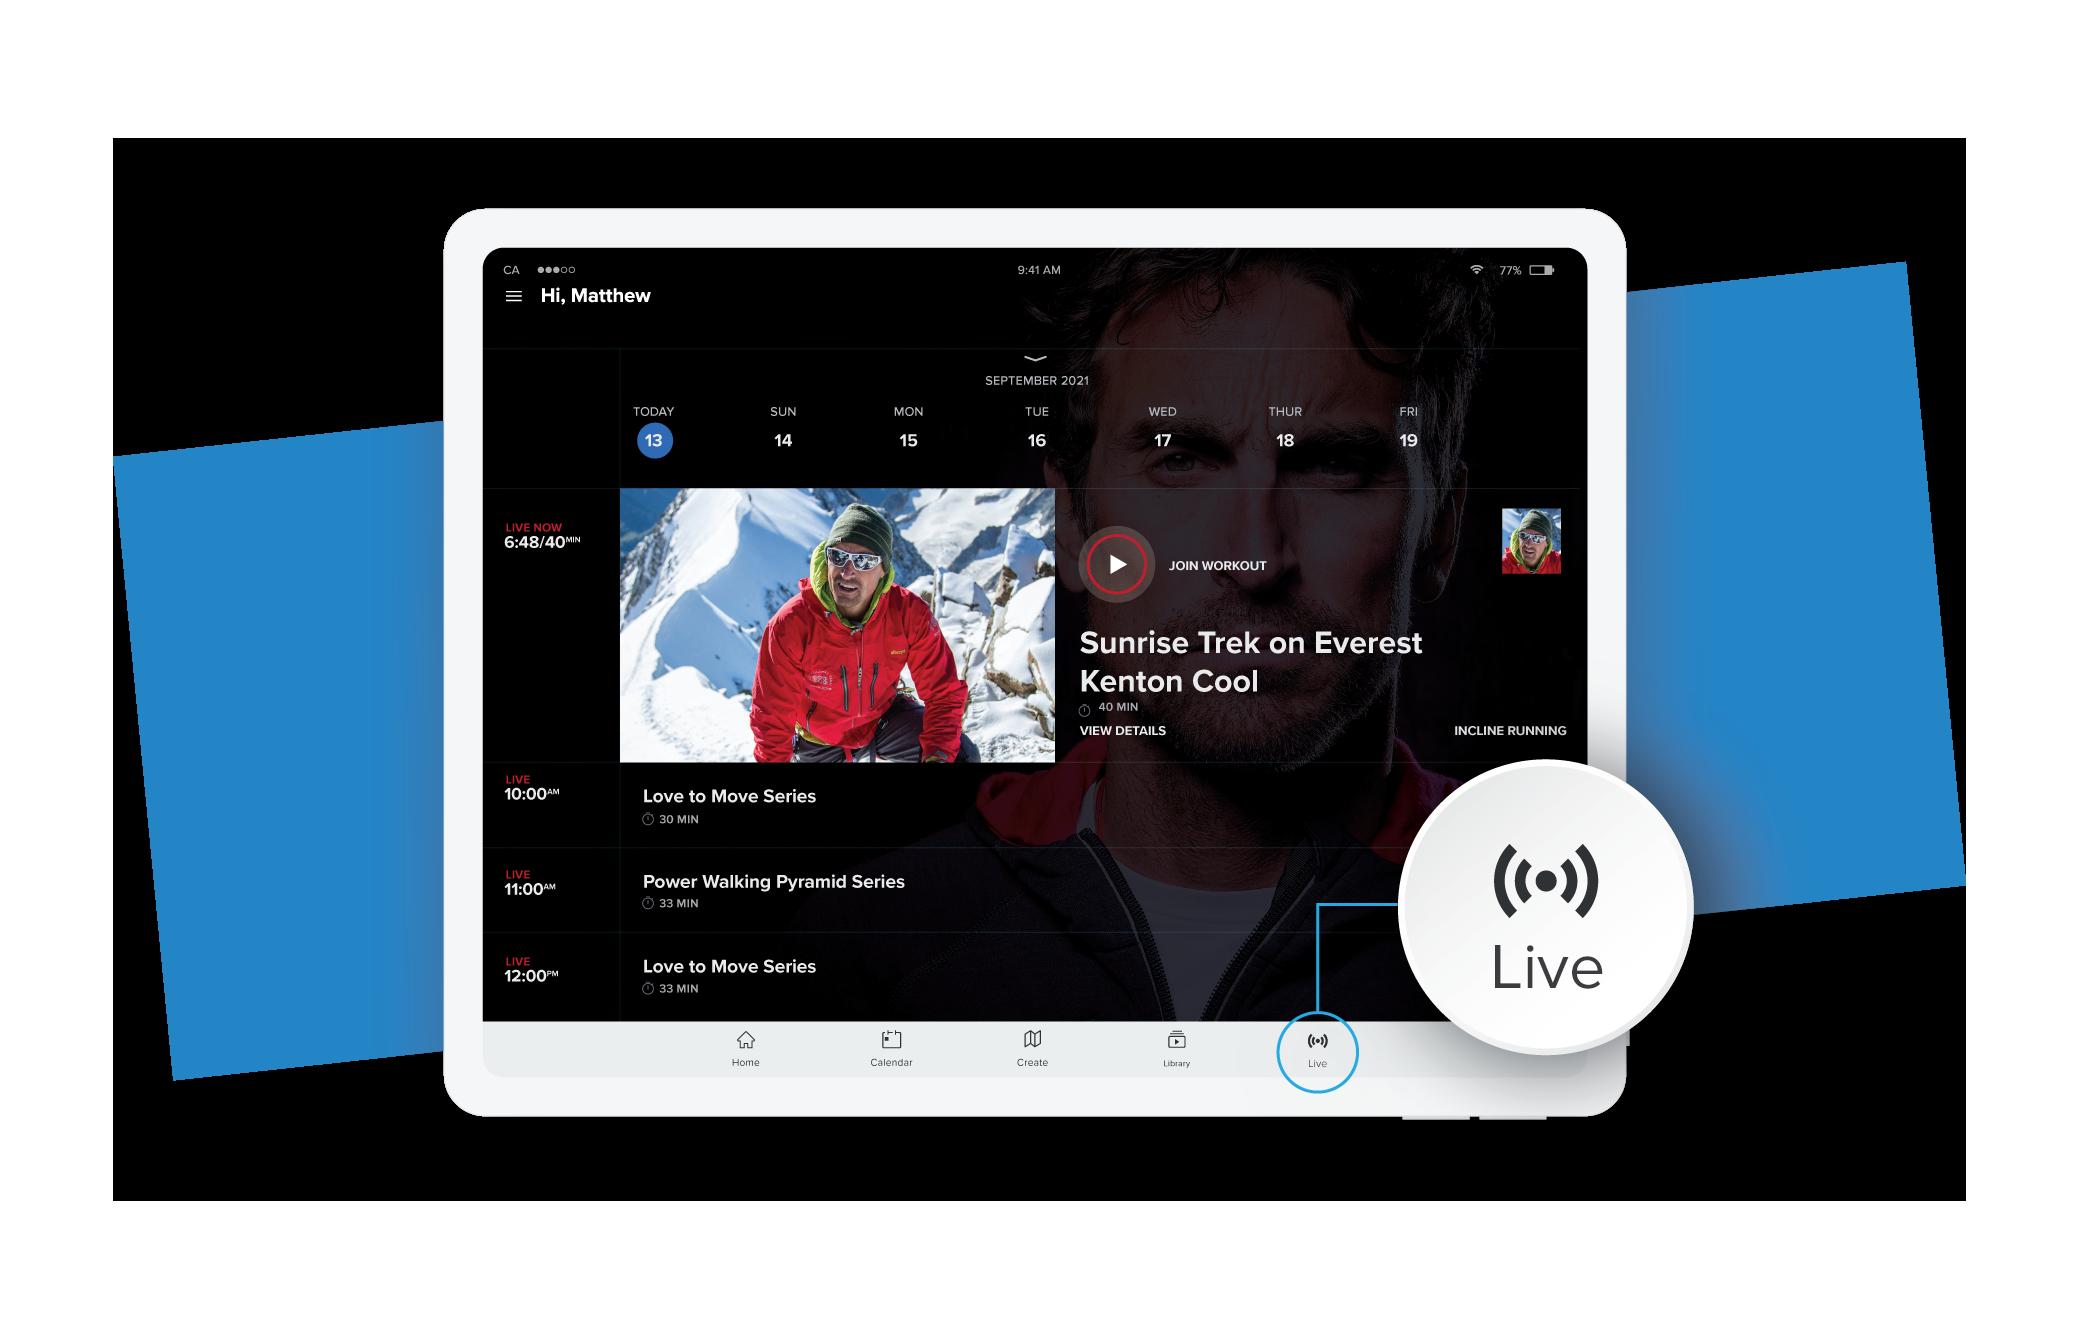 iFit Sunrise Trek on Everest: Live Workout